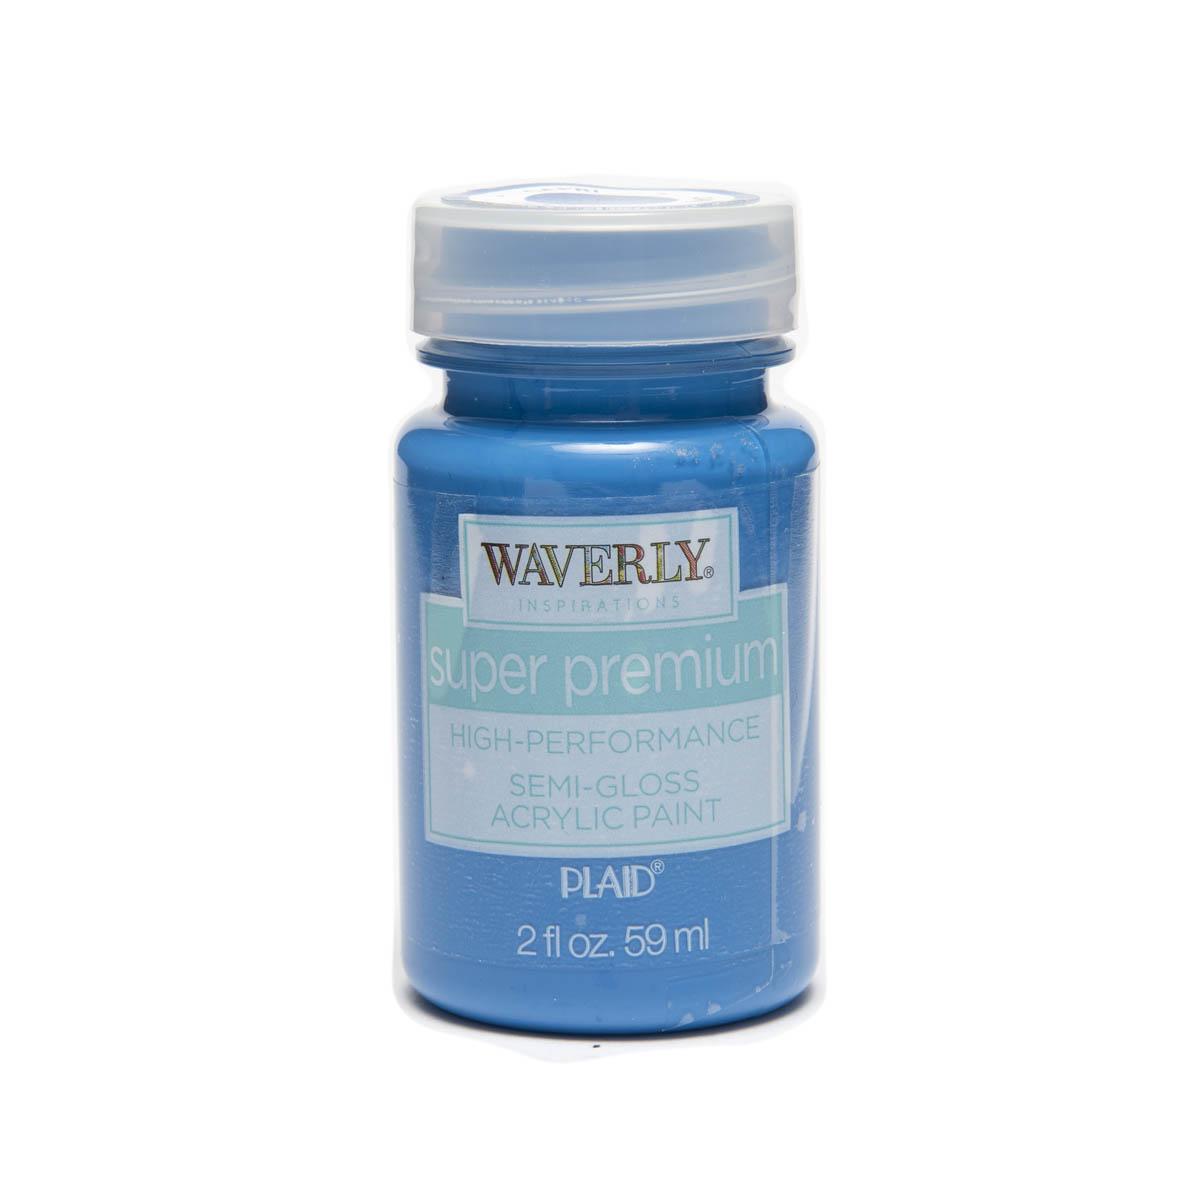 Waverly ® Inspirations Super Premium Semi-Gloss Acrylic Paint - Capri, 2 oz.